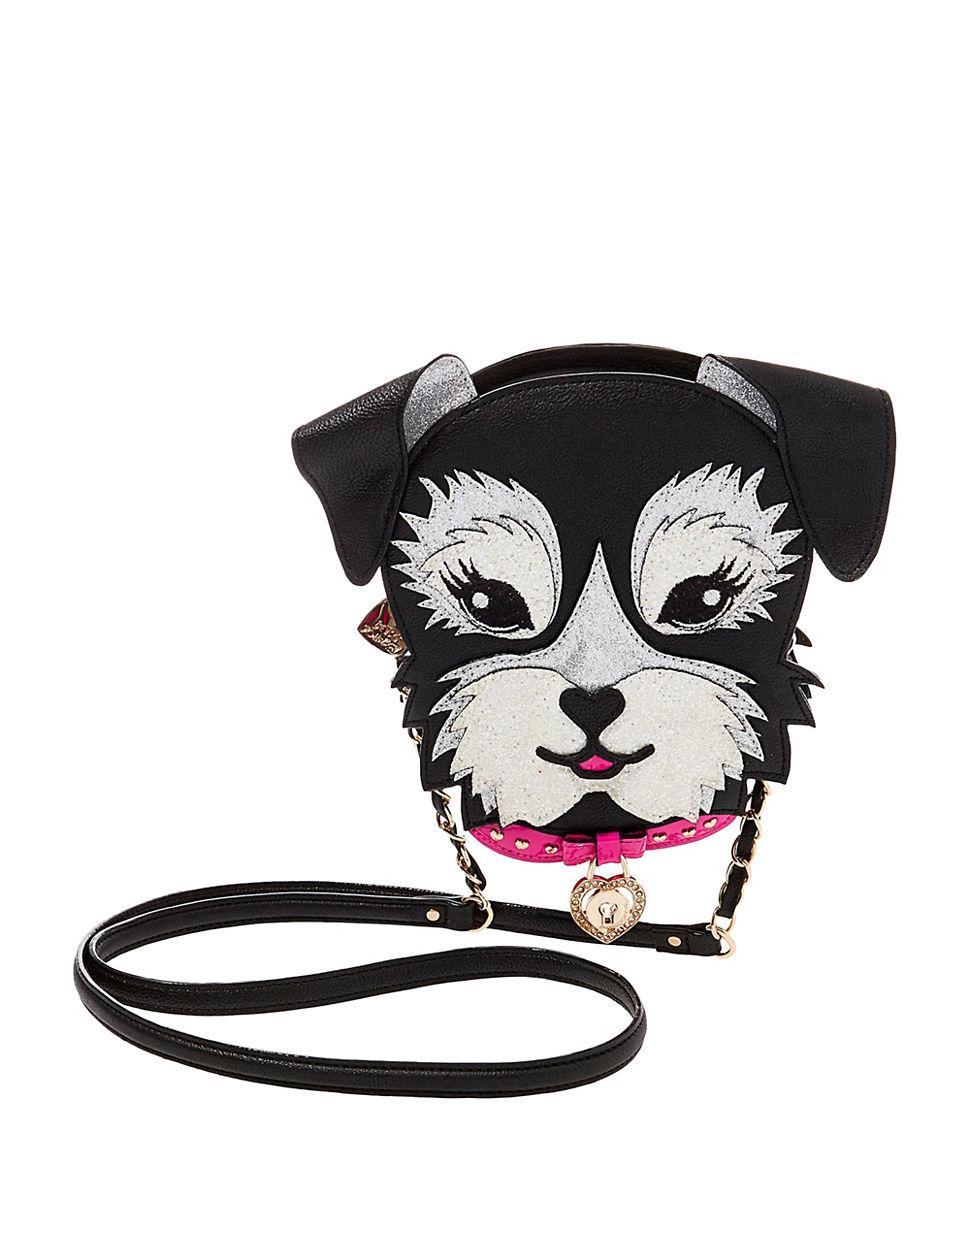 Betsey Johnson Fritzy Dog Crossbody Bag In Black Lyst